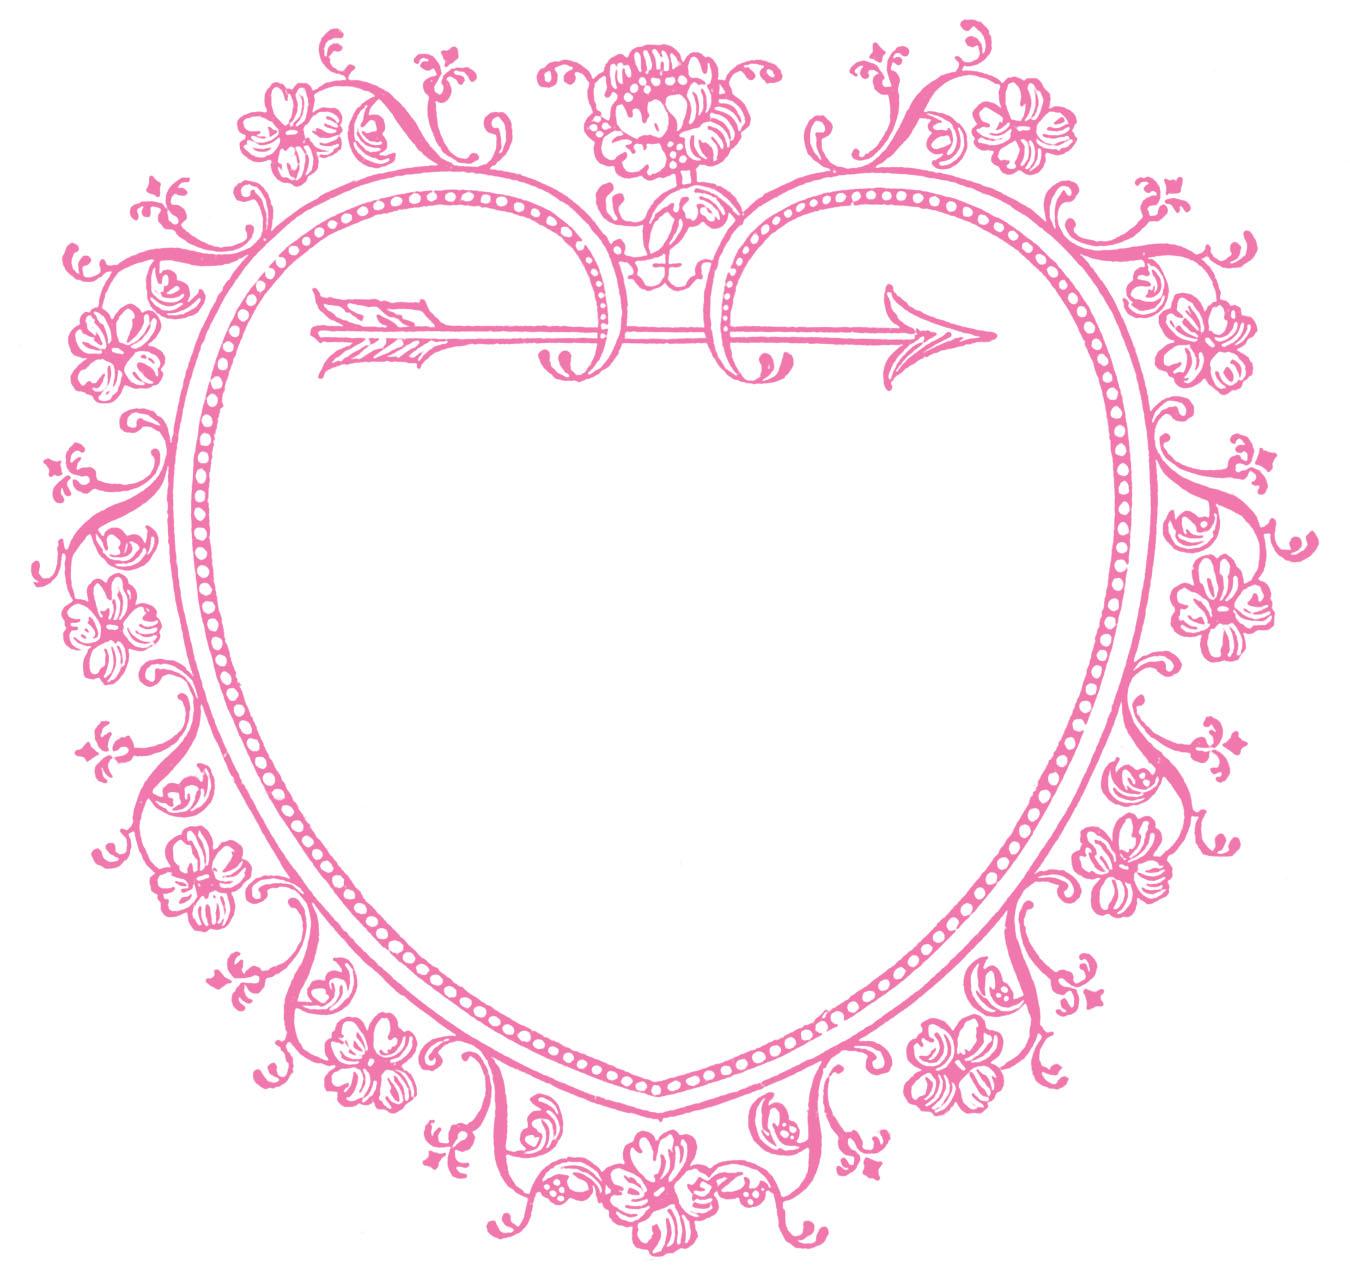 hight resolution of 1350x1265 vintage valentine s day clip art